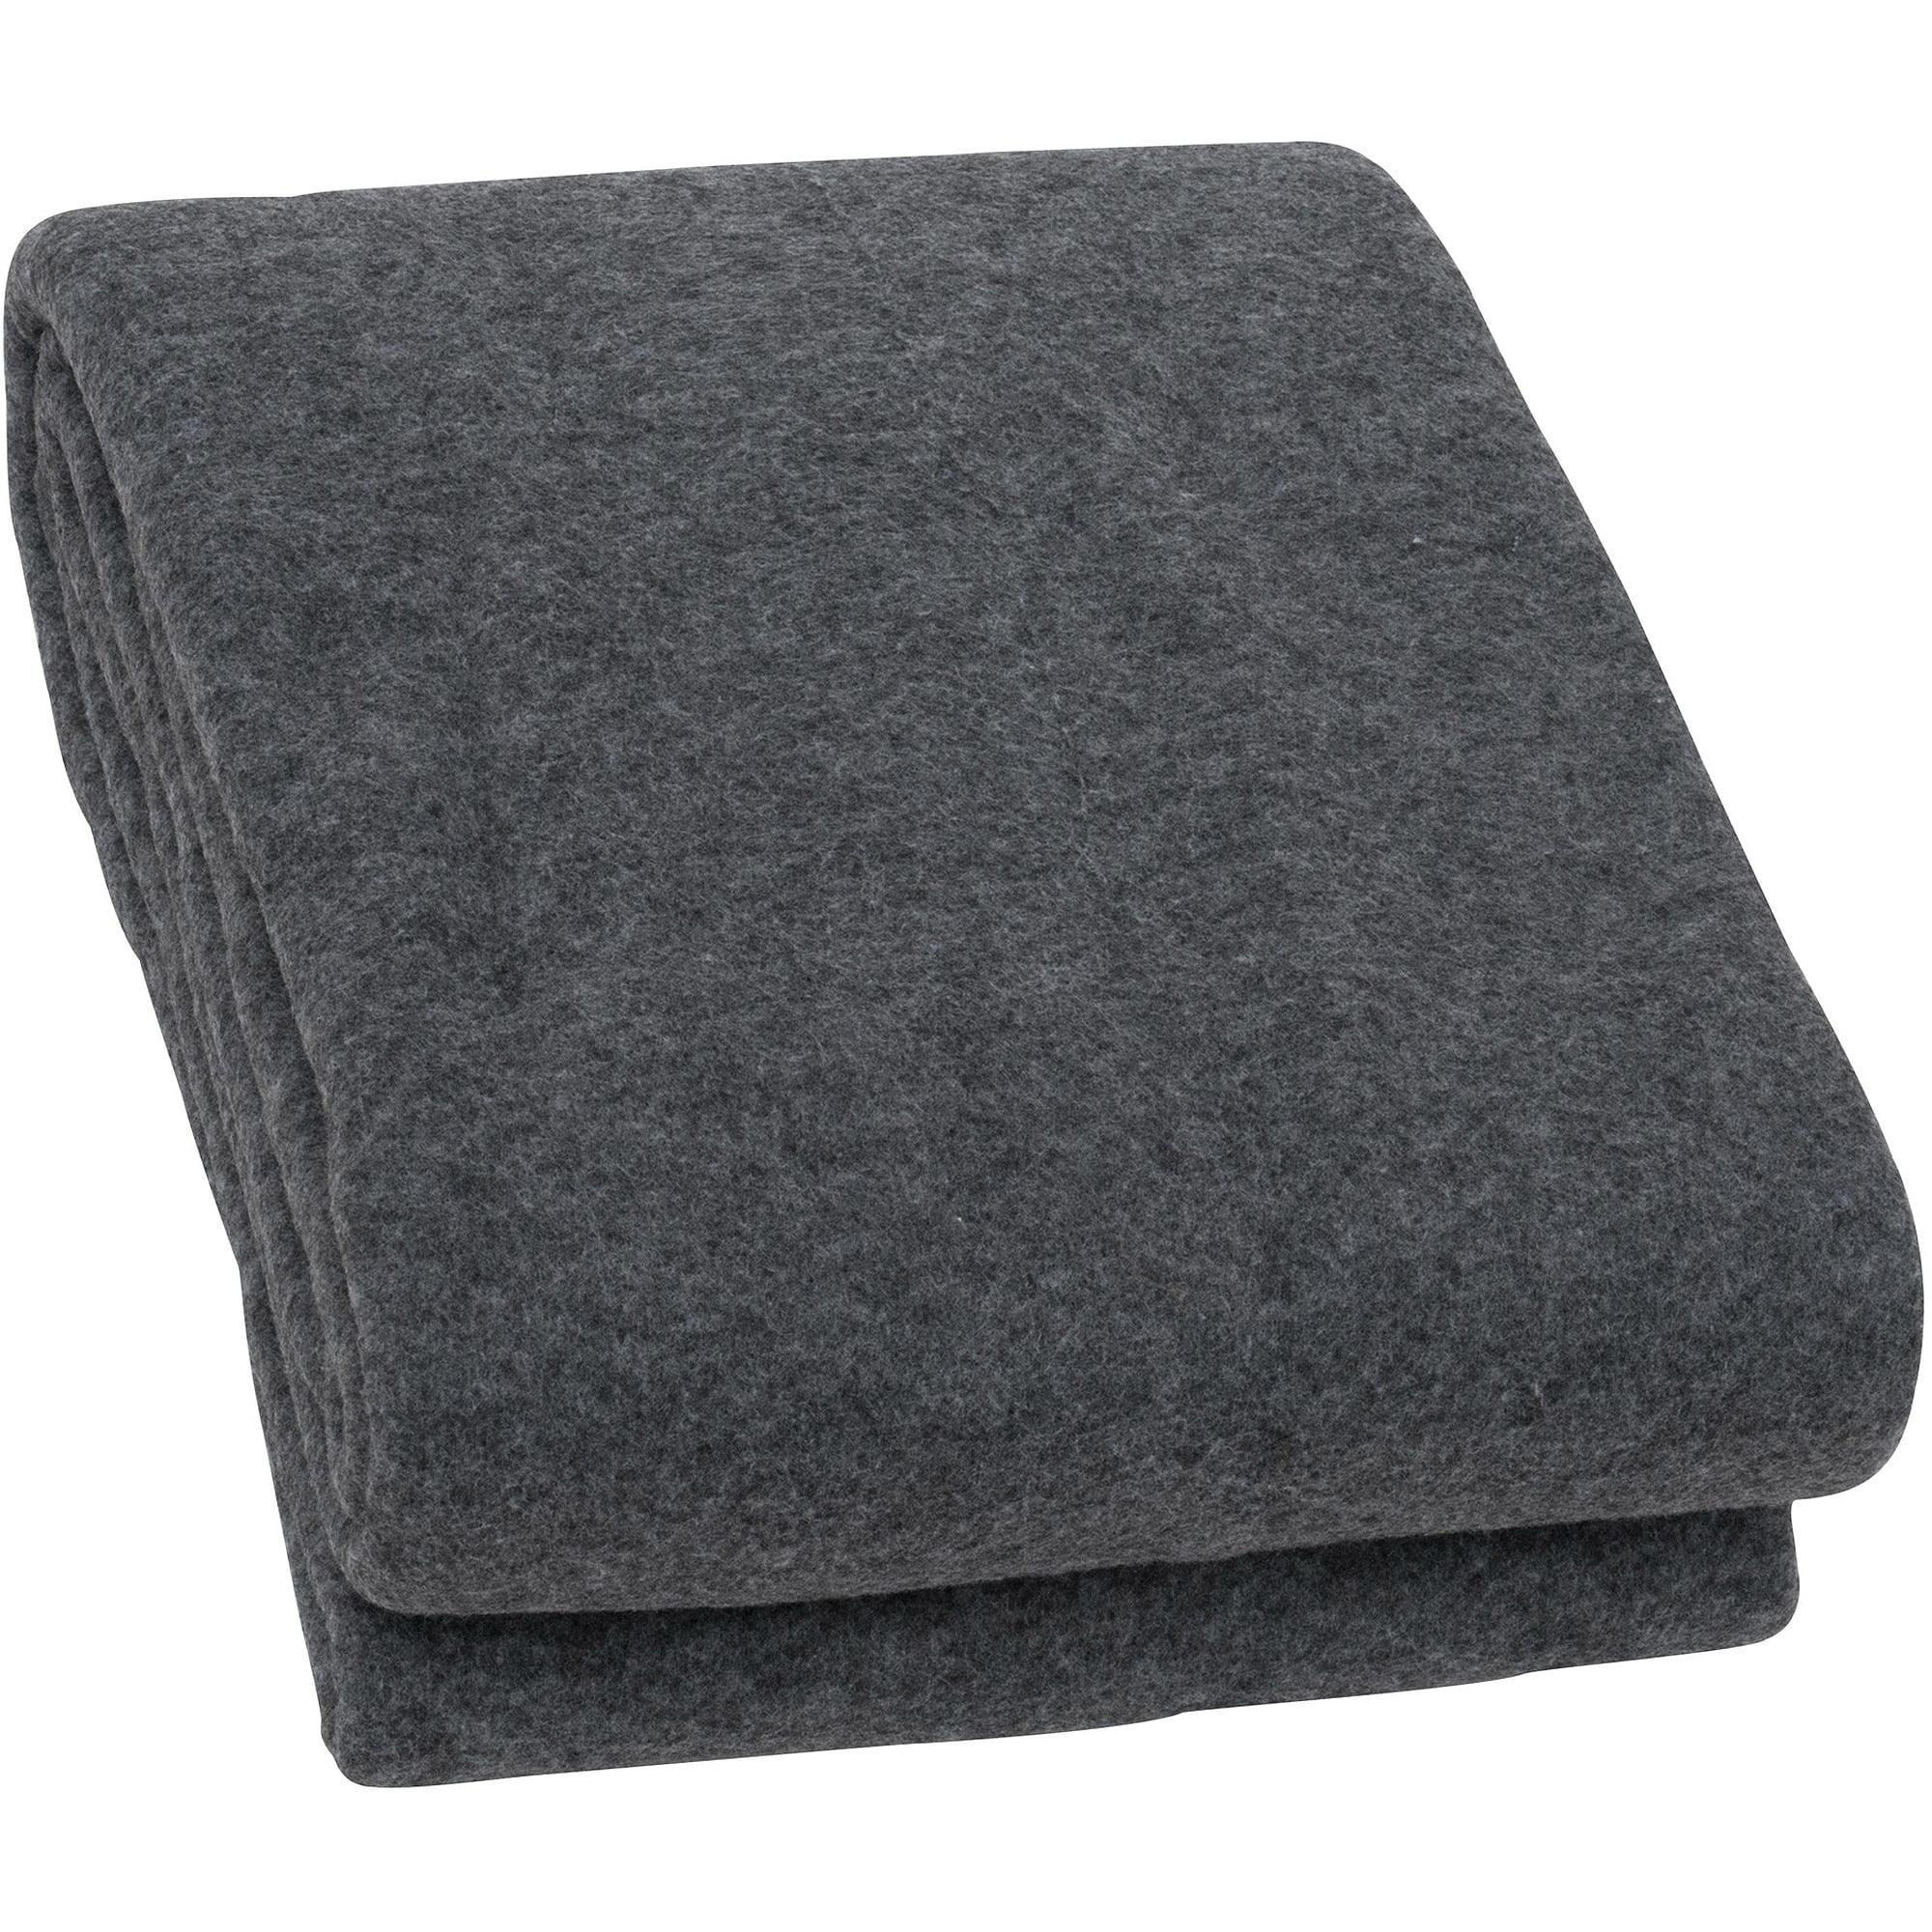 Mainstays OPP Blanket, Grey